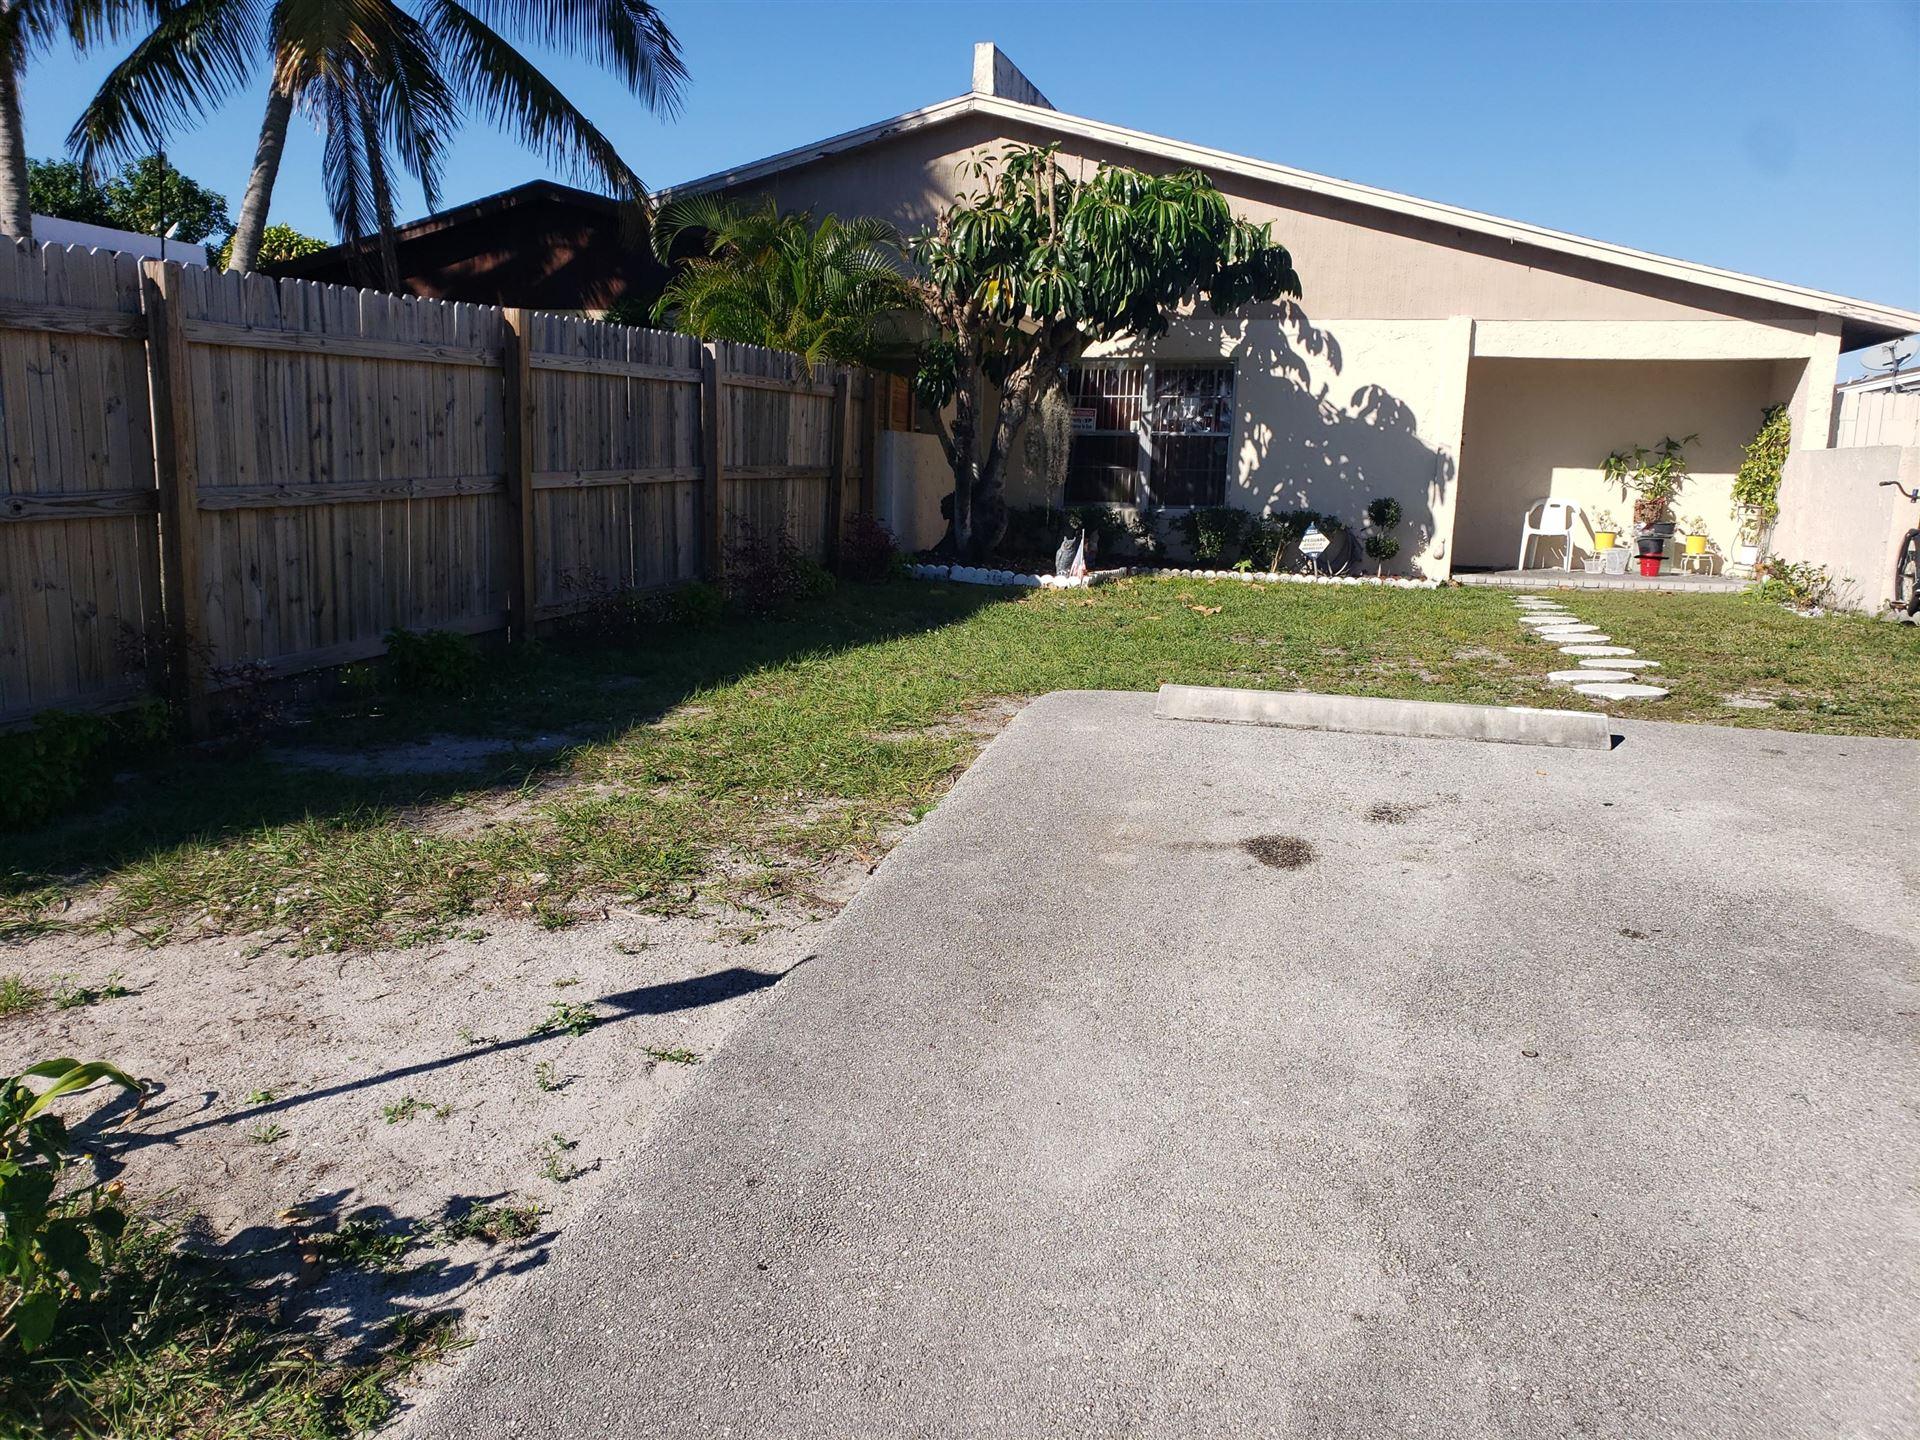 5805 S Rue Road, West Palm Beach, FL 33415 - MLS#: RX-10679887